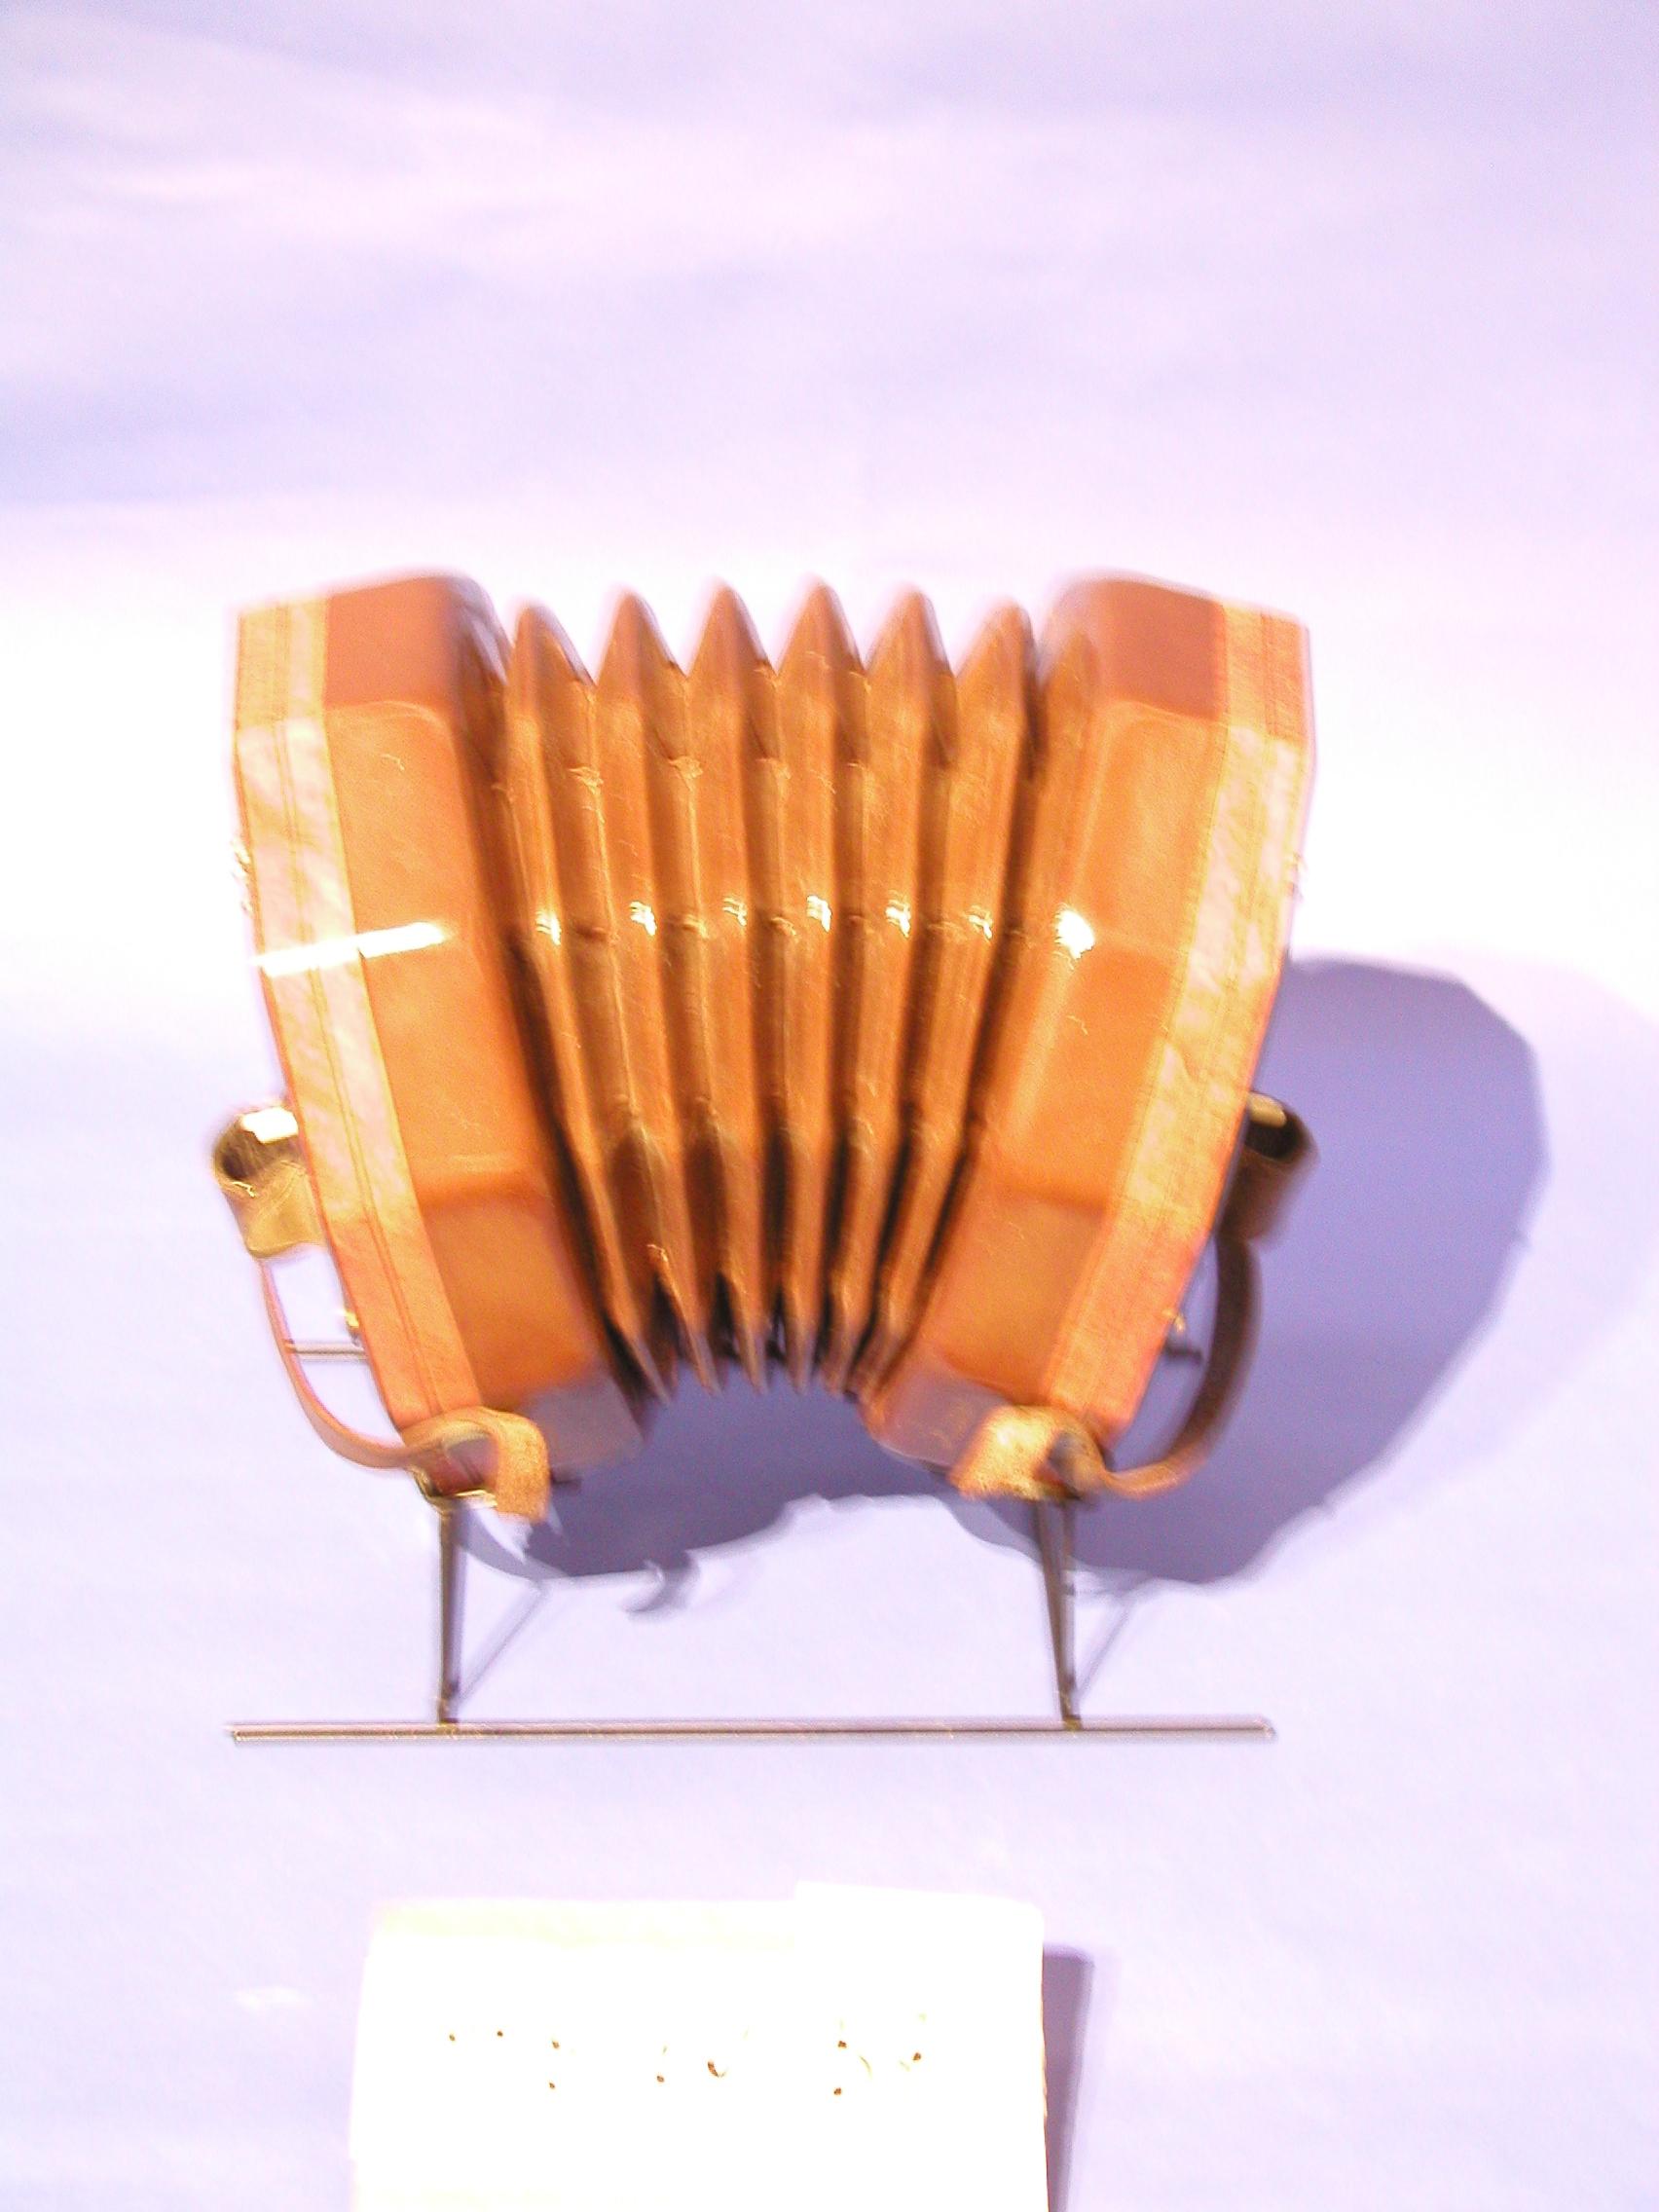 Lachenal concertina dating